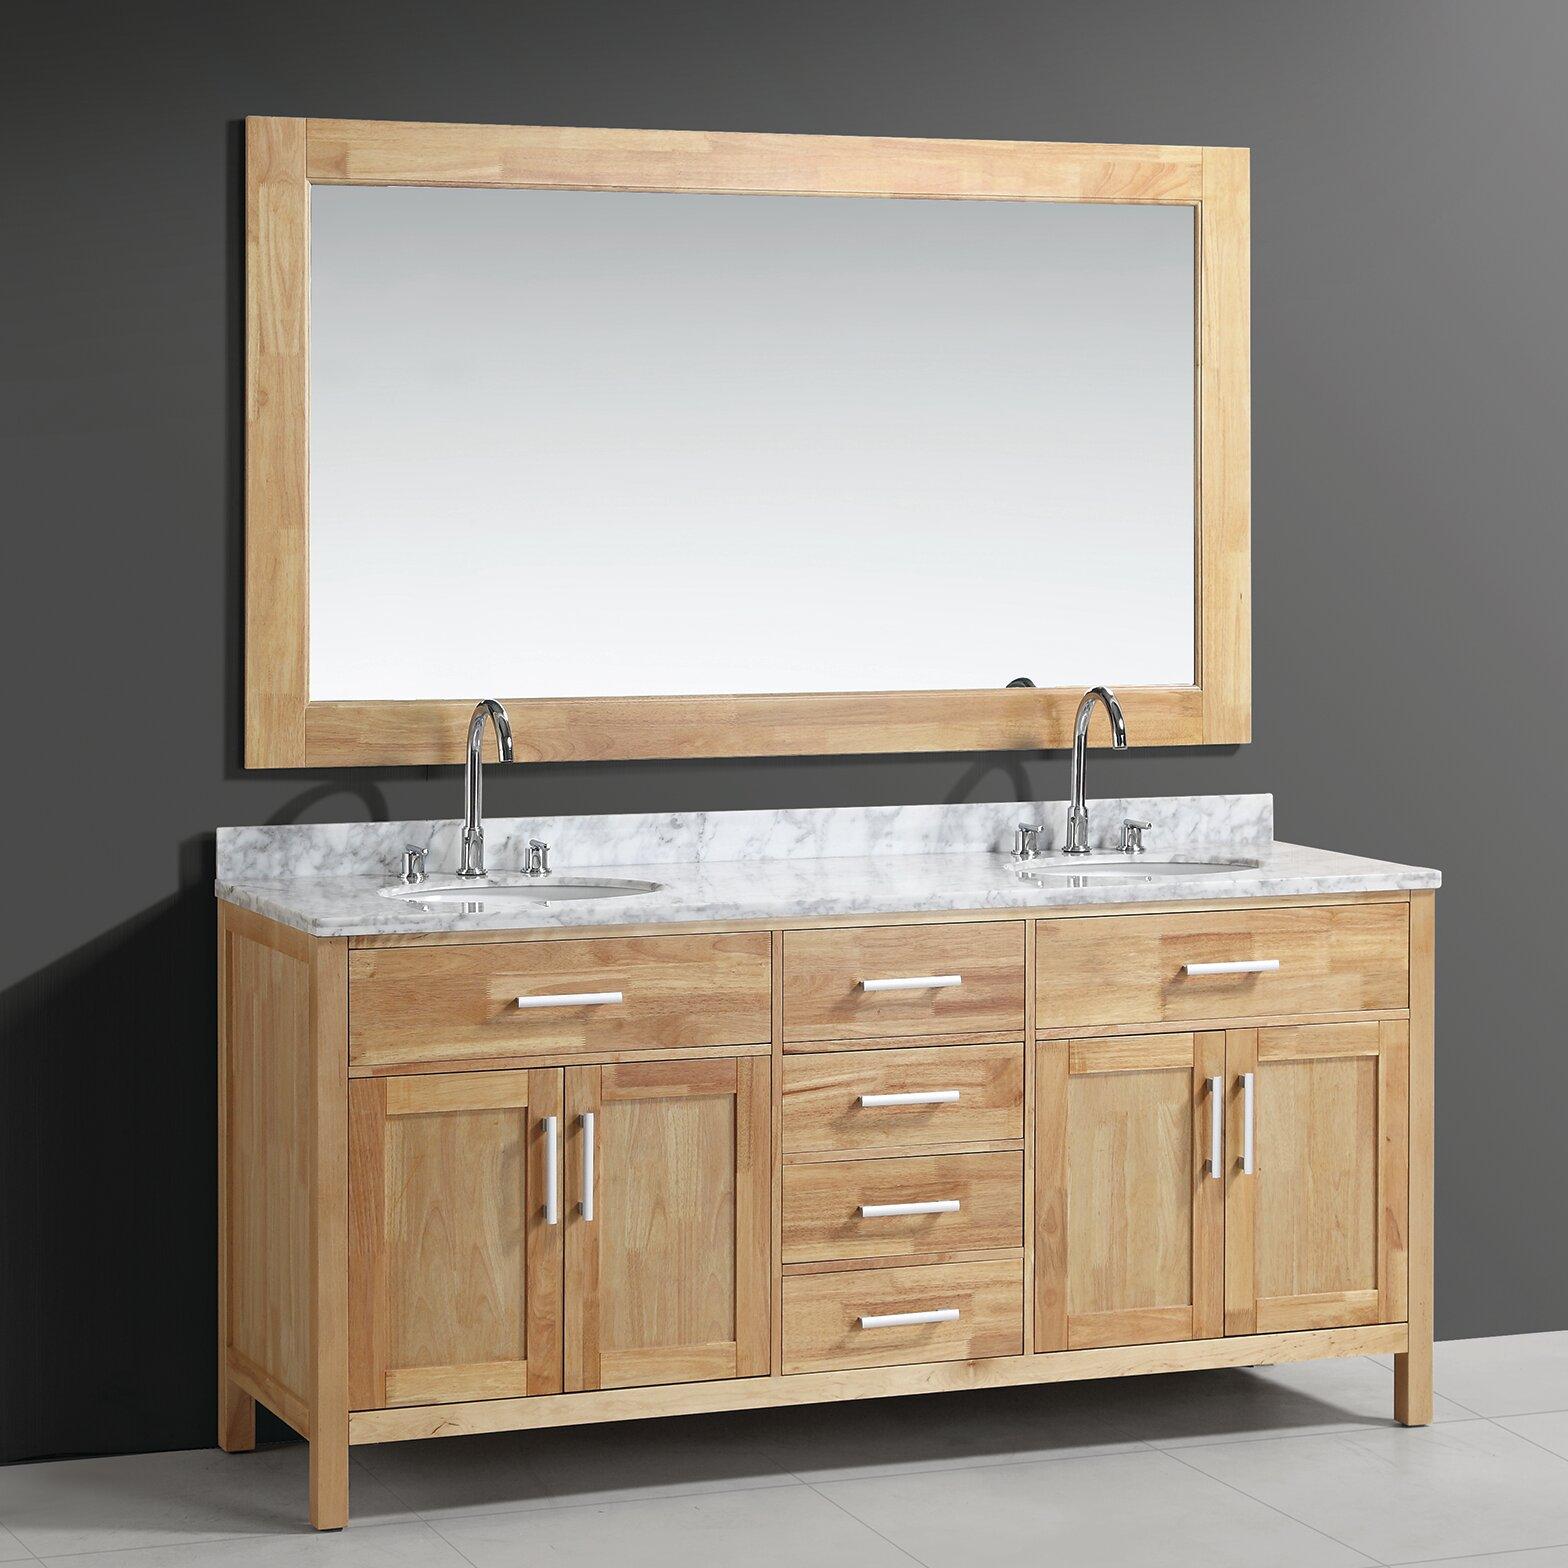 Double bathroom vanity - Halcomb 72 Double Bathroom Vanity Set With Mirror